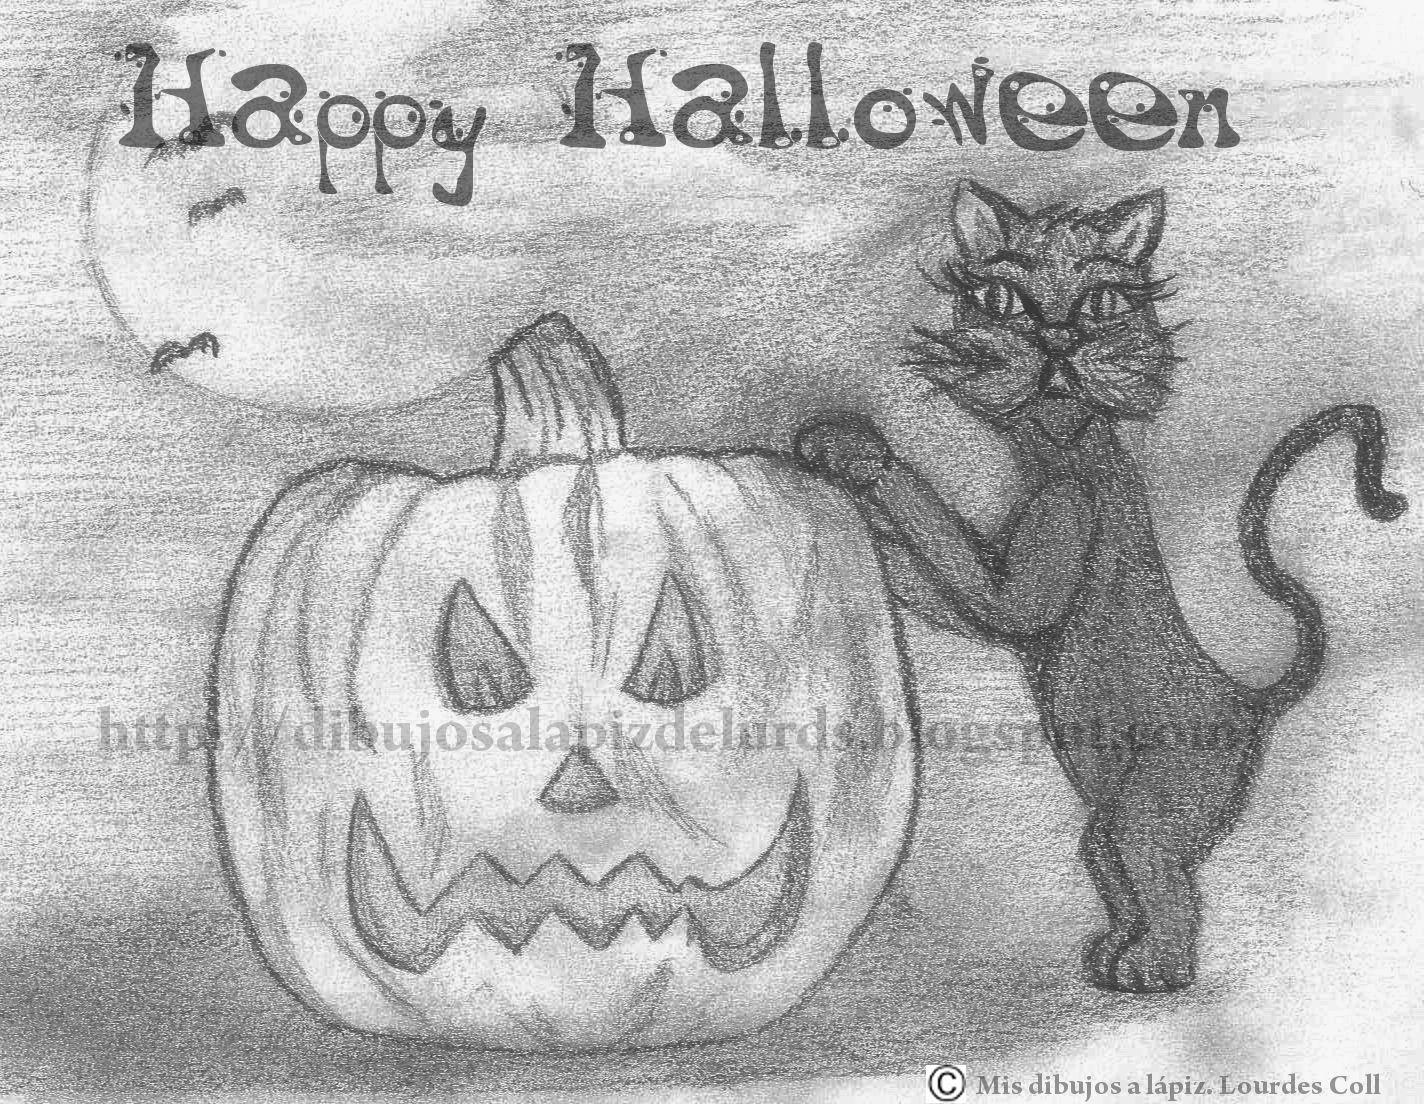 Worksheet. Mis dibujos a lpiz Feliz Halloween  Mis dibujos a lapiz